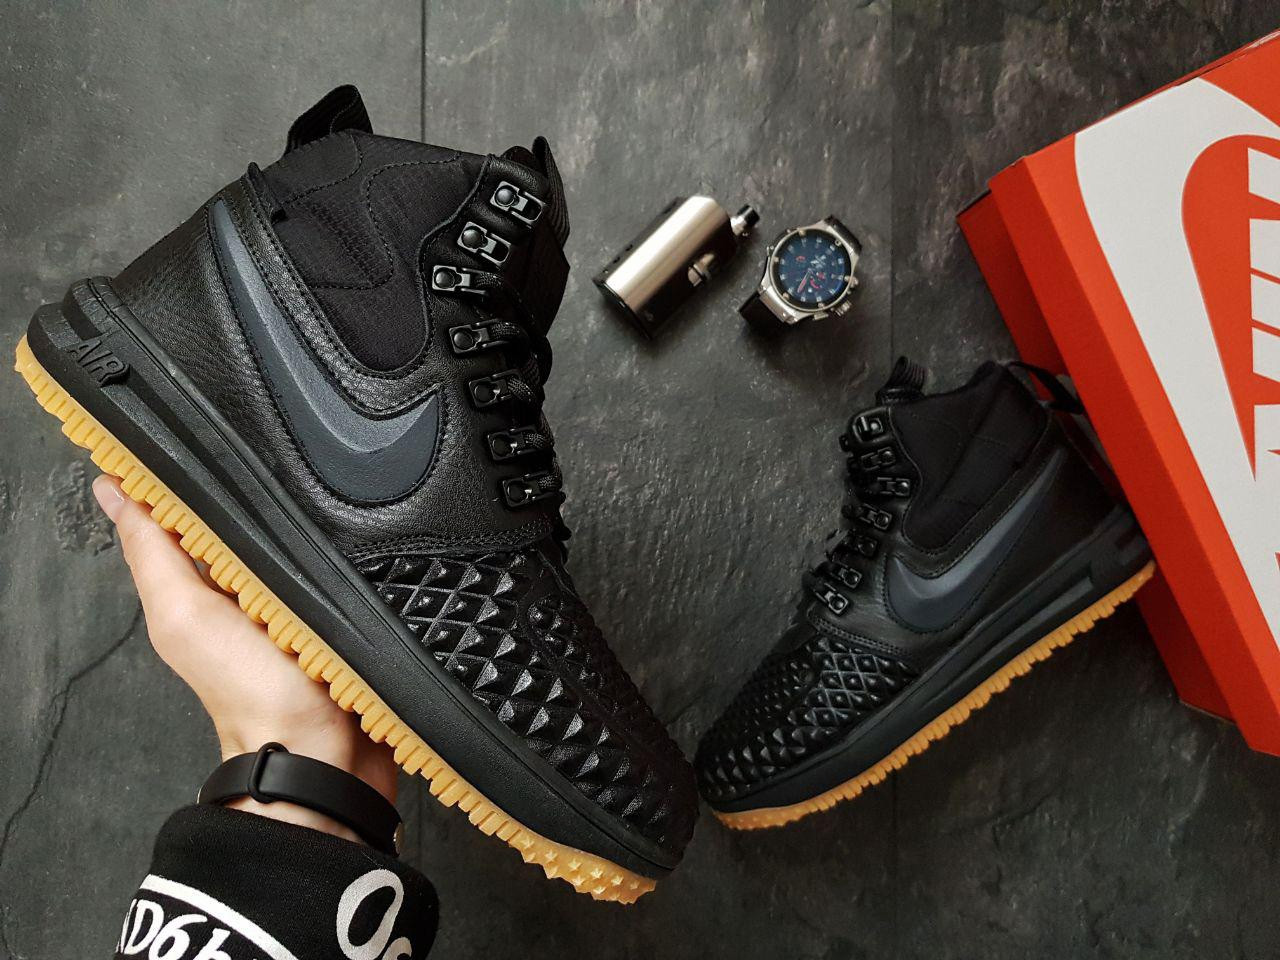 0c4d3ab1bd8e Кроссовки Nike Air Force 1 Dackboot 17 / Black|White (реплика ...